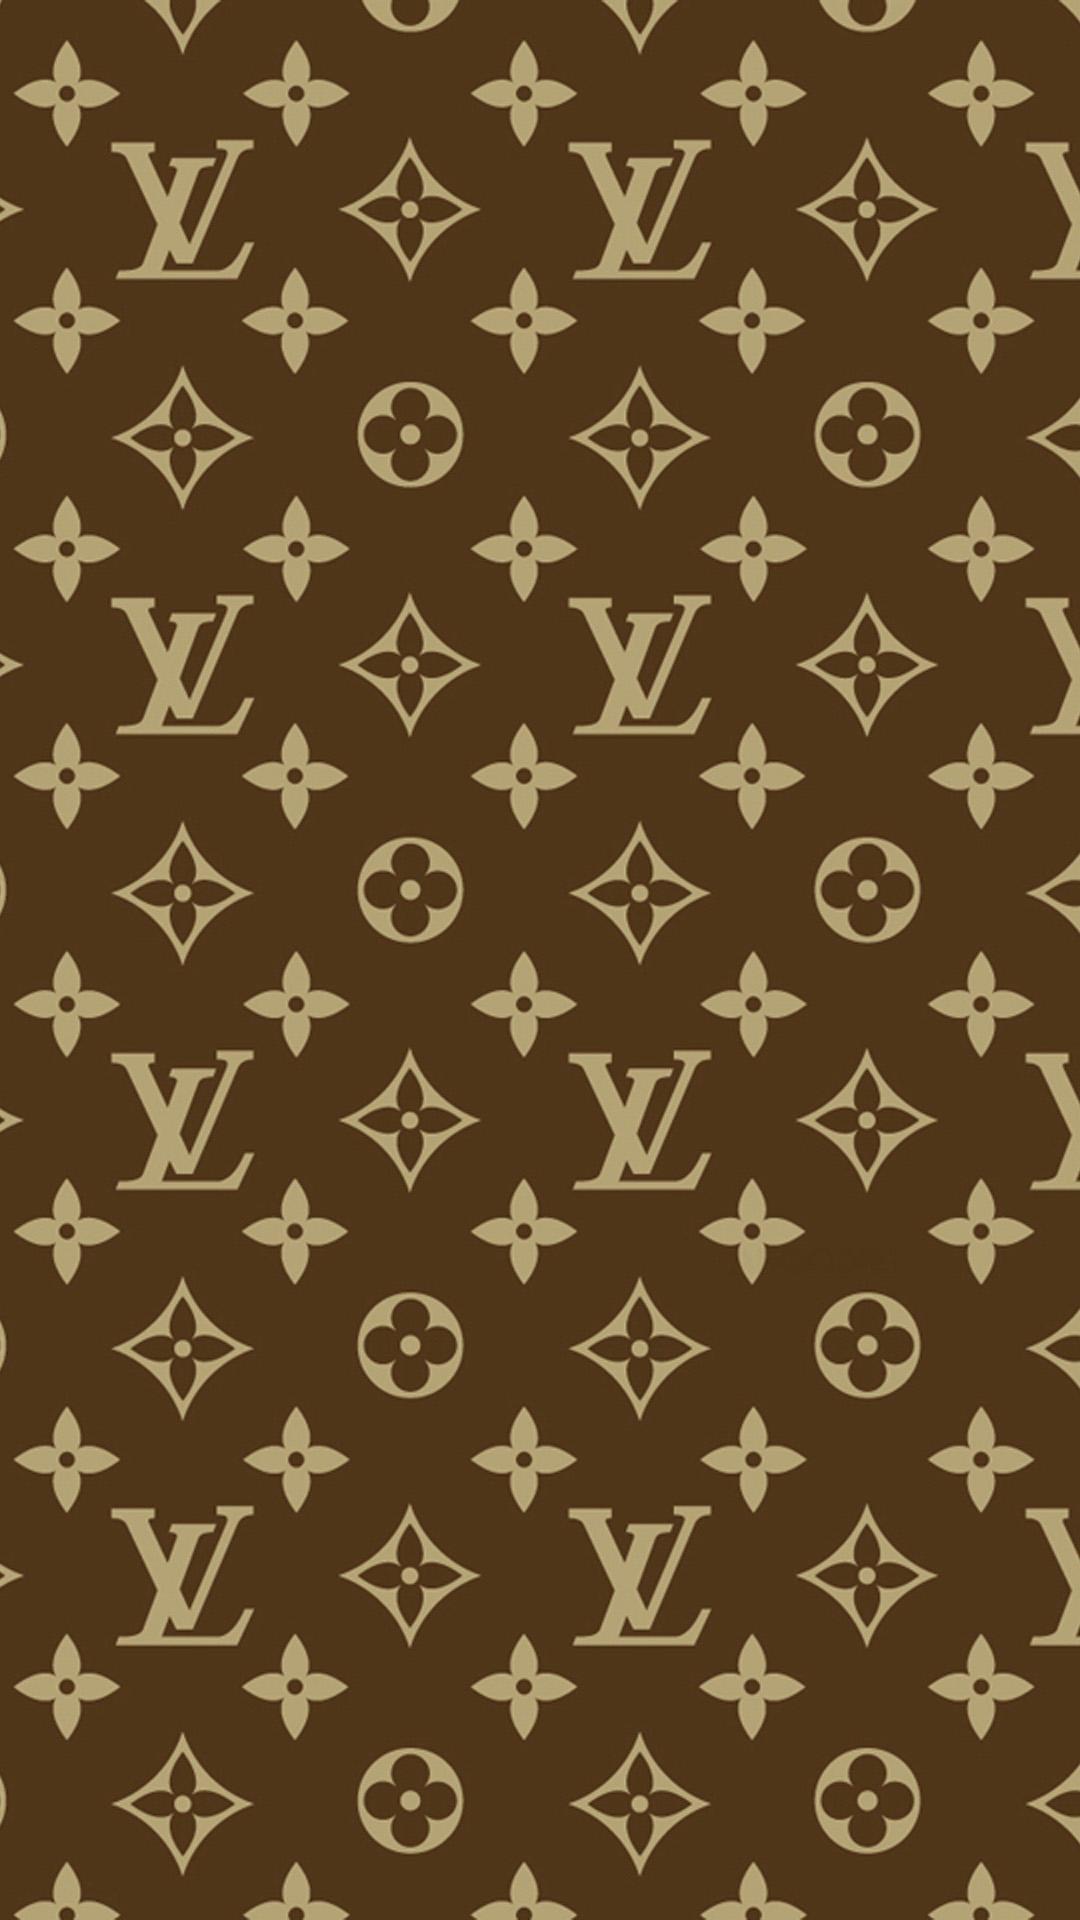 49 Louis Vuitton Wallpaper For Bedroom On Wallpapersafari